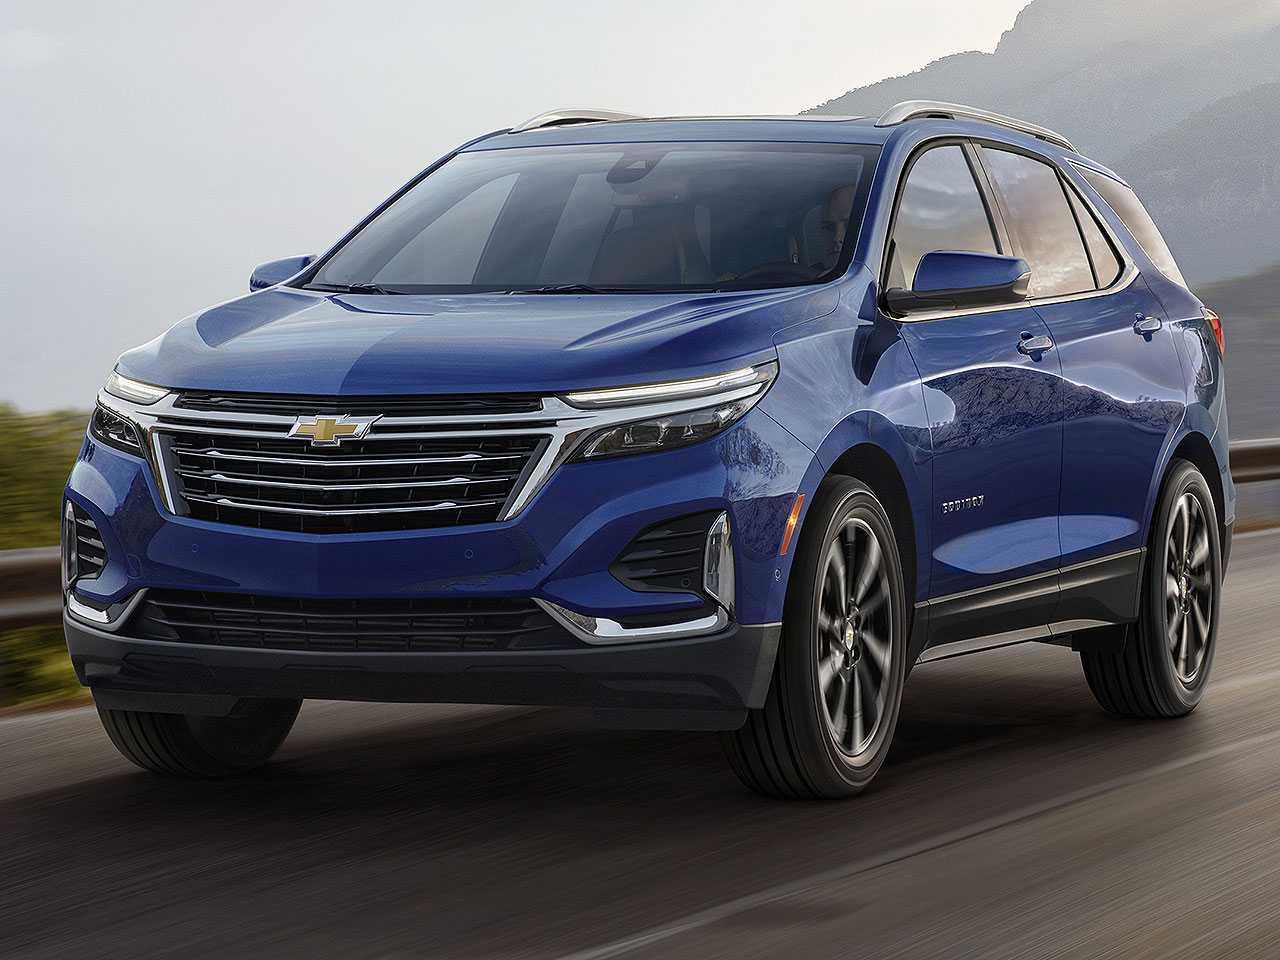 Chevrolet Equinox 2022